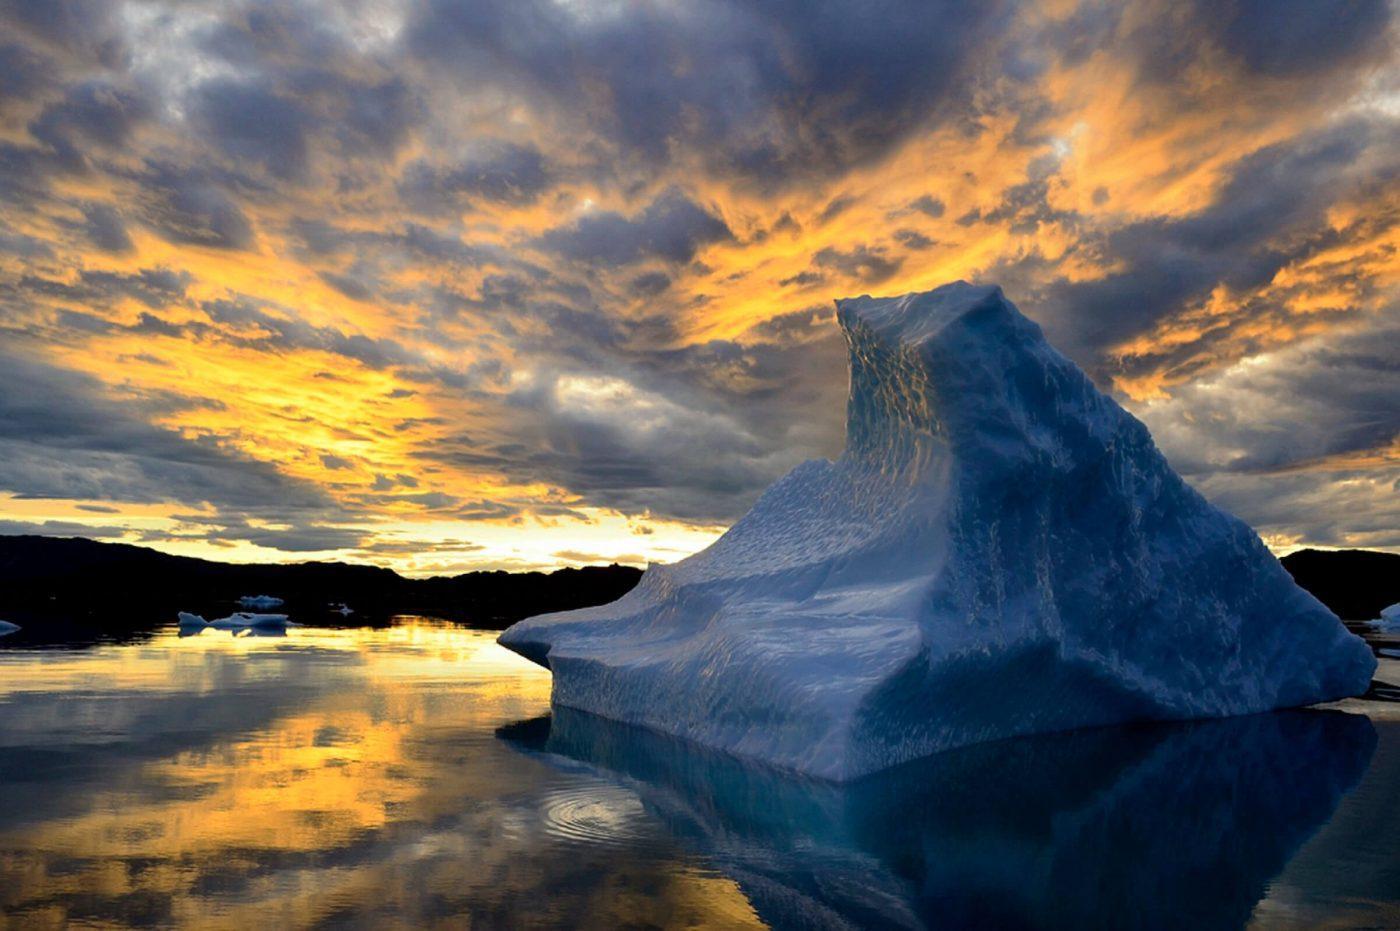 Iceberg in sunset, by Ole J. Petersen